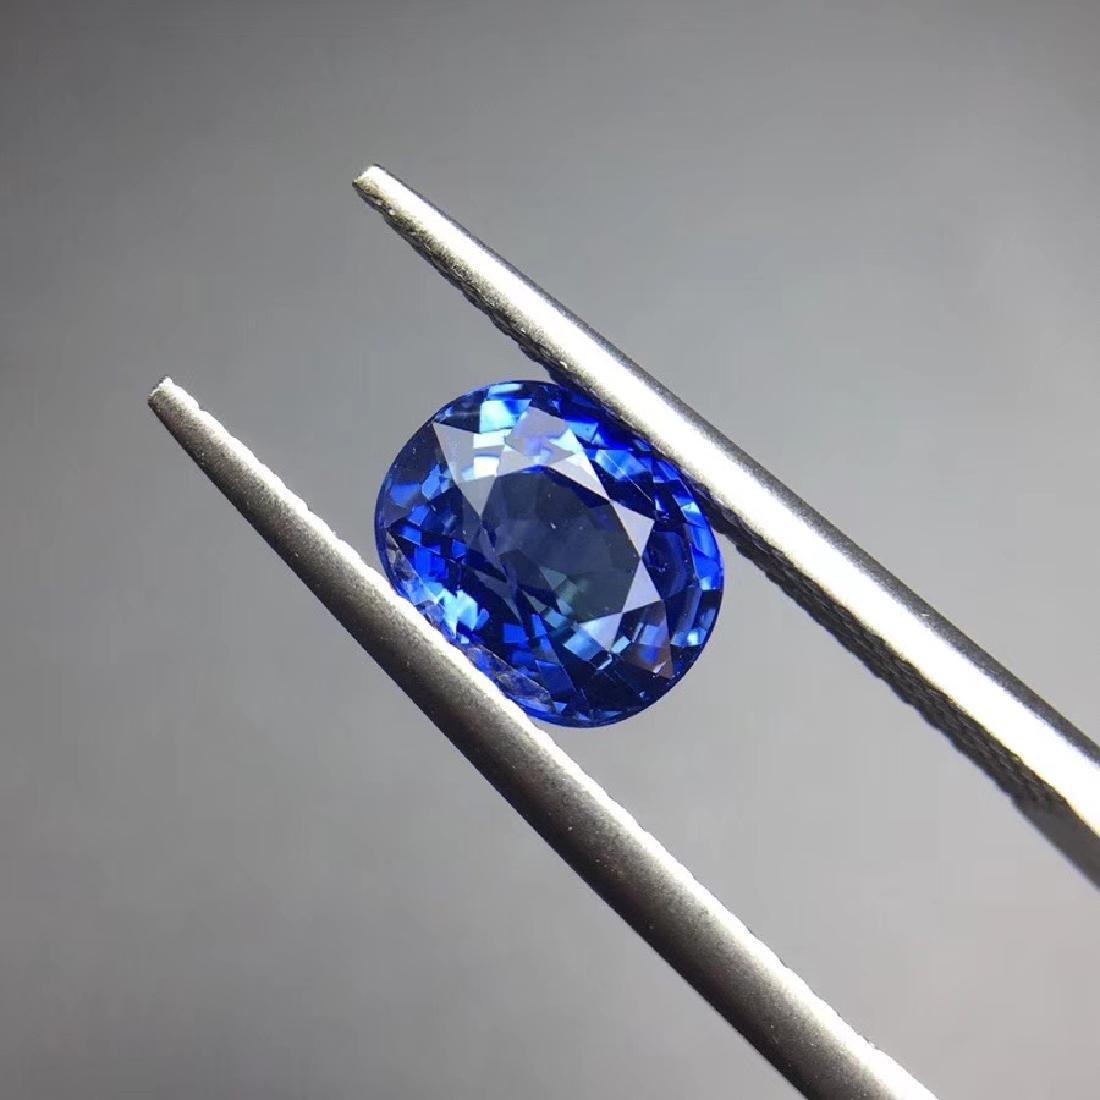 1.85 ct Sapphire 7.4*6.0*4.4 mm Oval Cut - 2